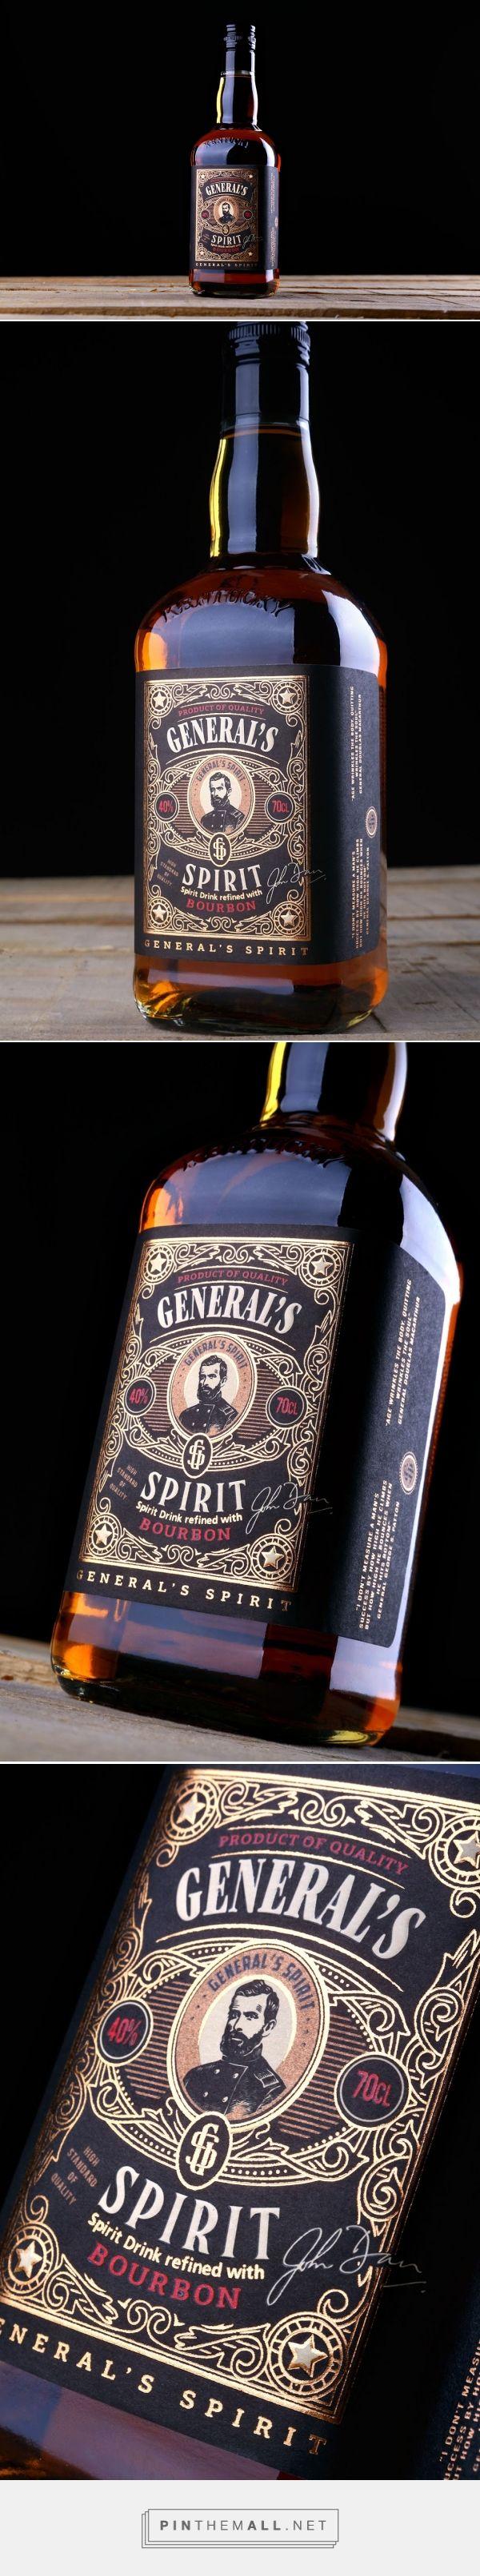 General's Spiri - Packaging of the World - Creative Package Design Gallery - http://www.packagingoftheworld.com/2016/09/generals-spirit.html